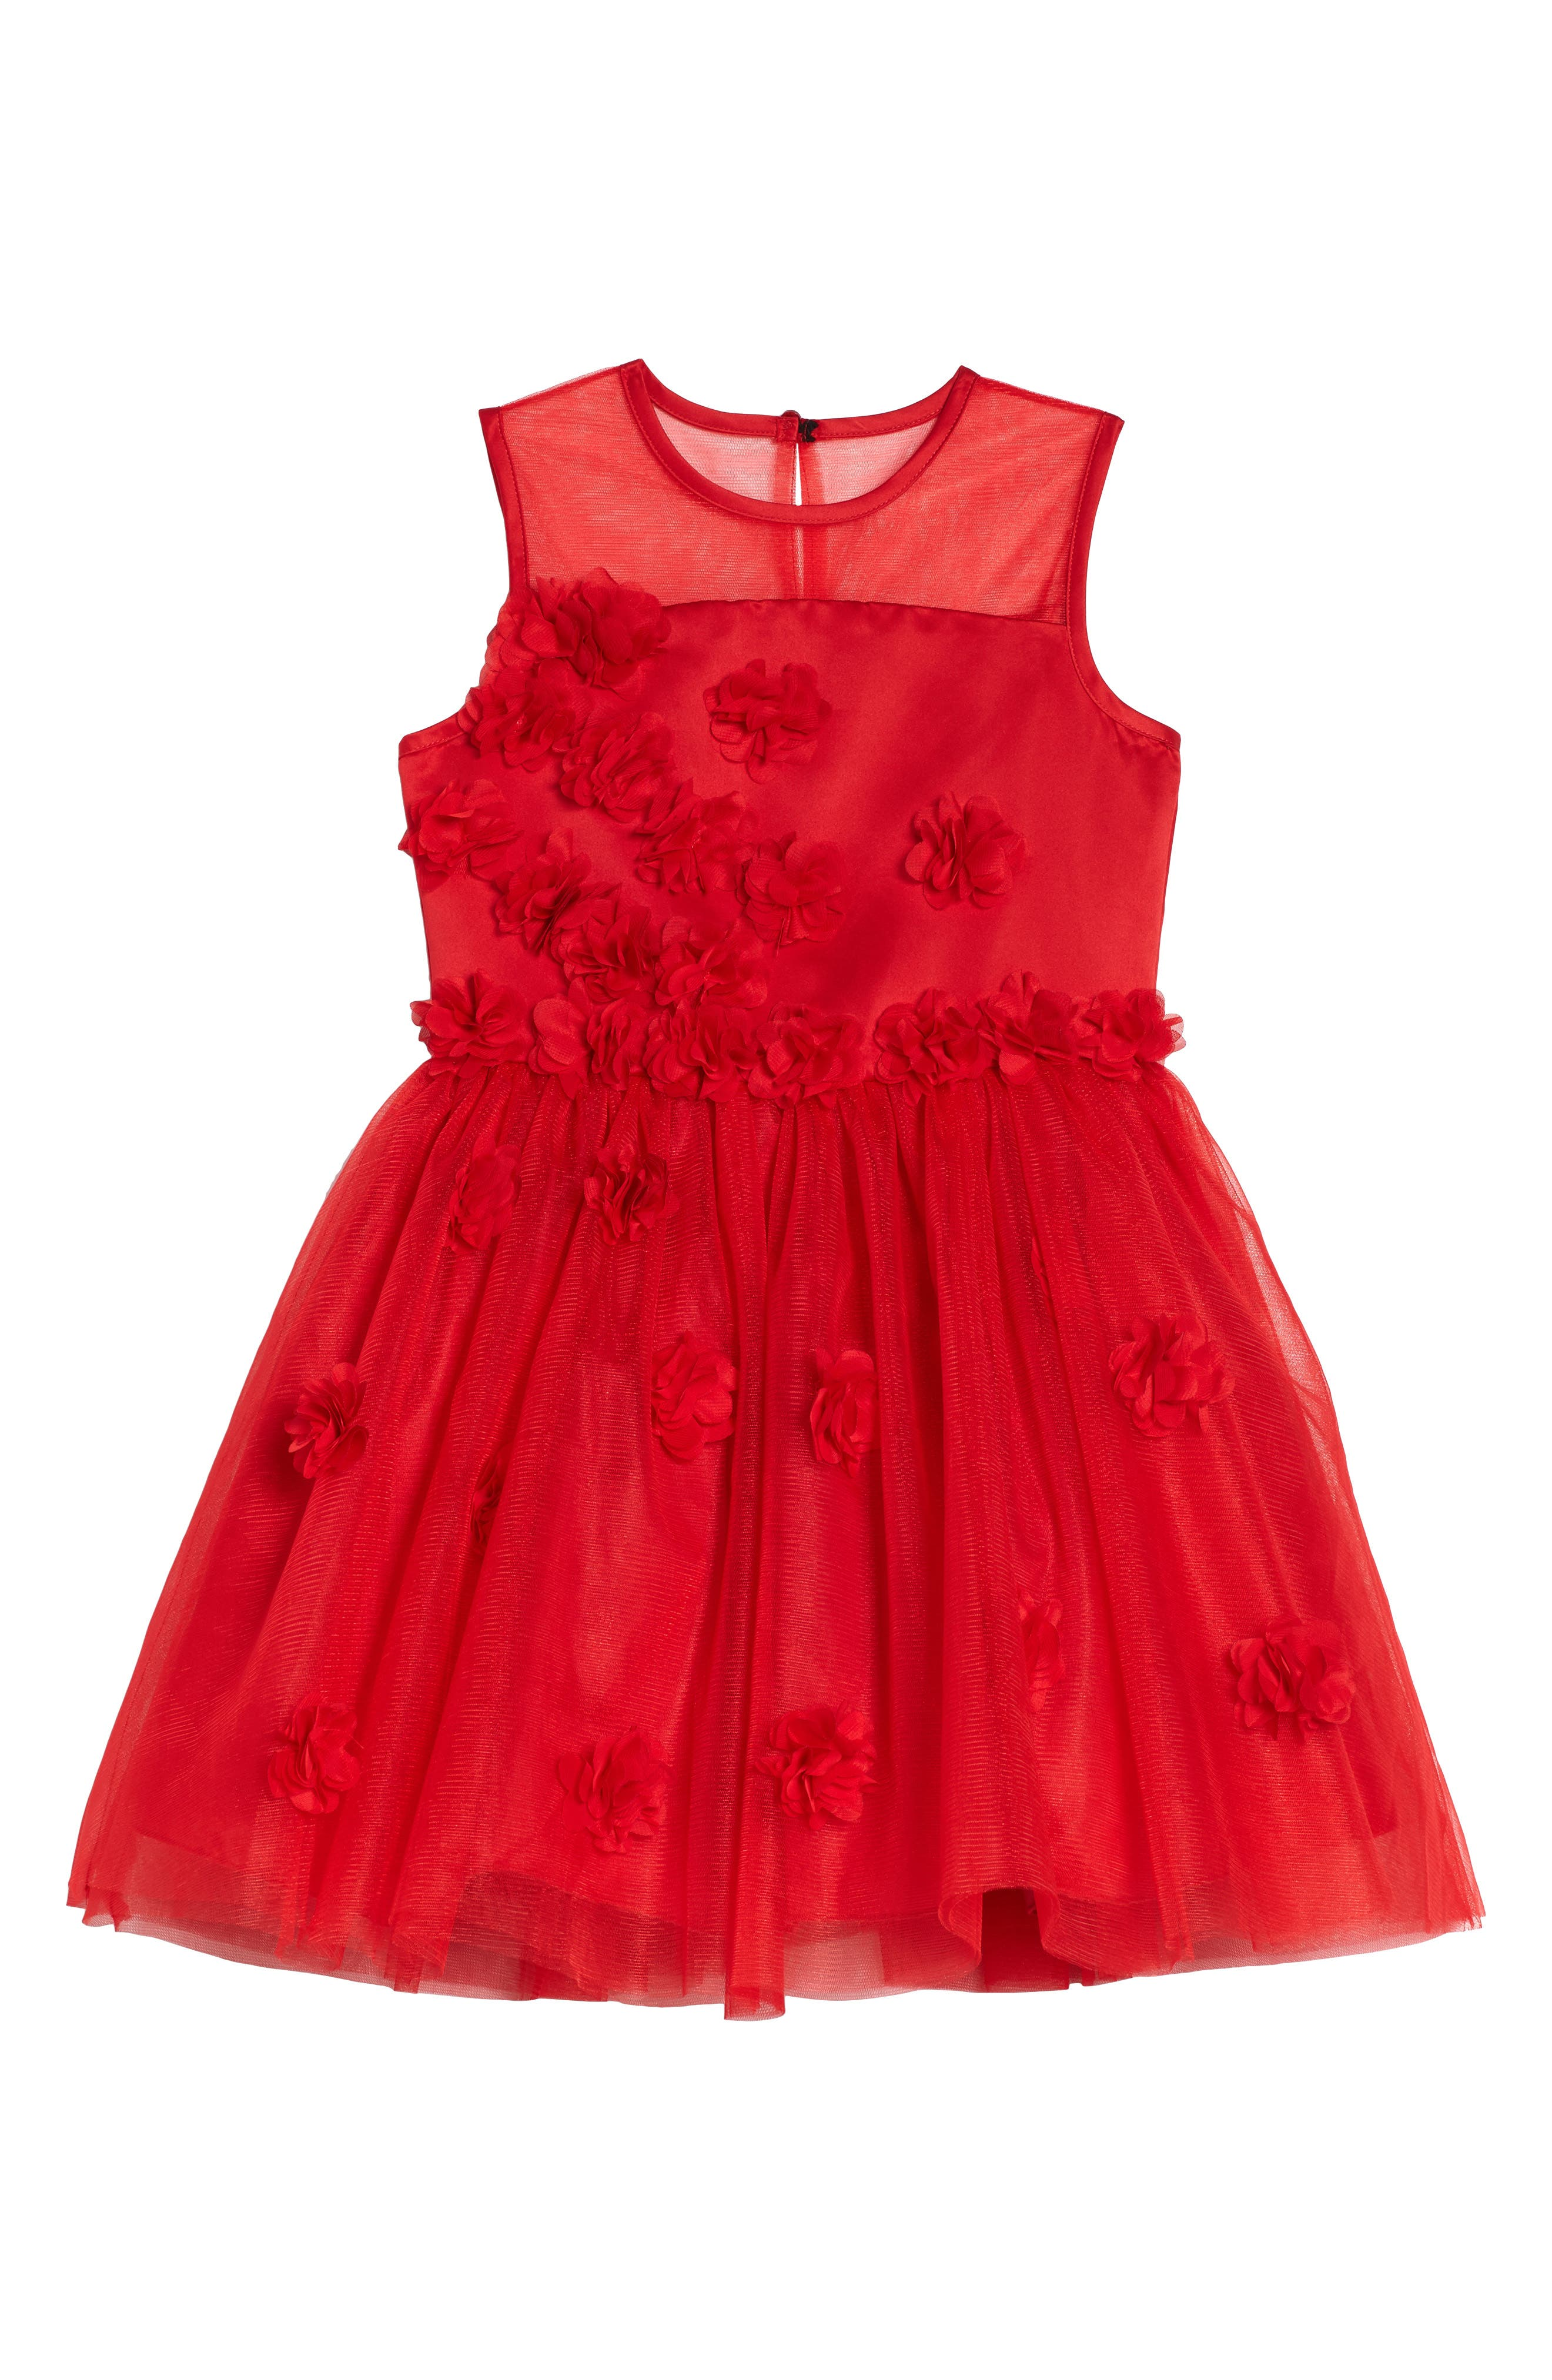 Floral Embellished Sleeveless Dress,                         Main,                         color, Red